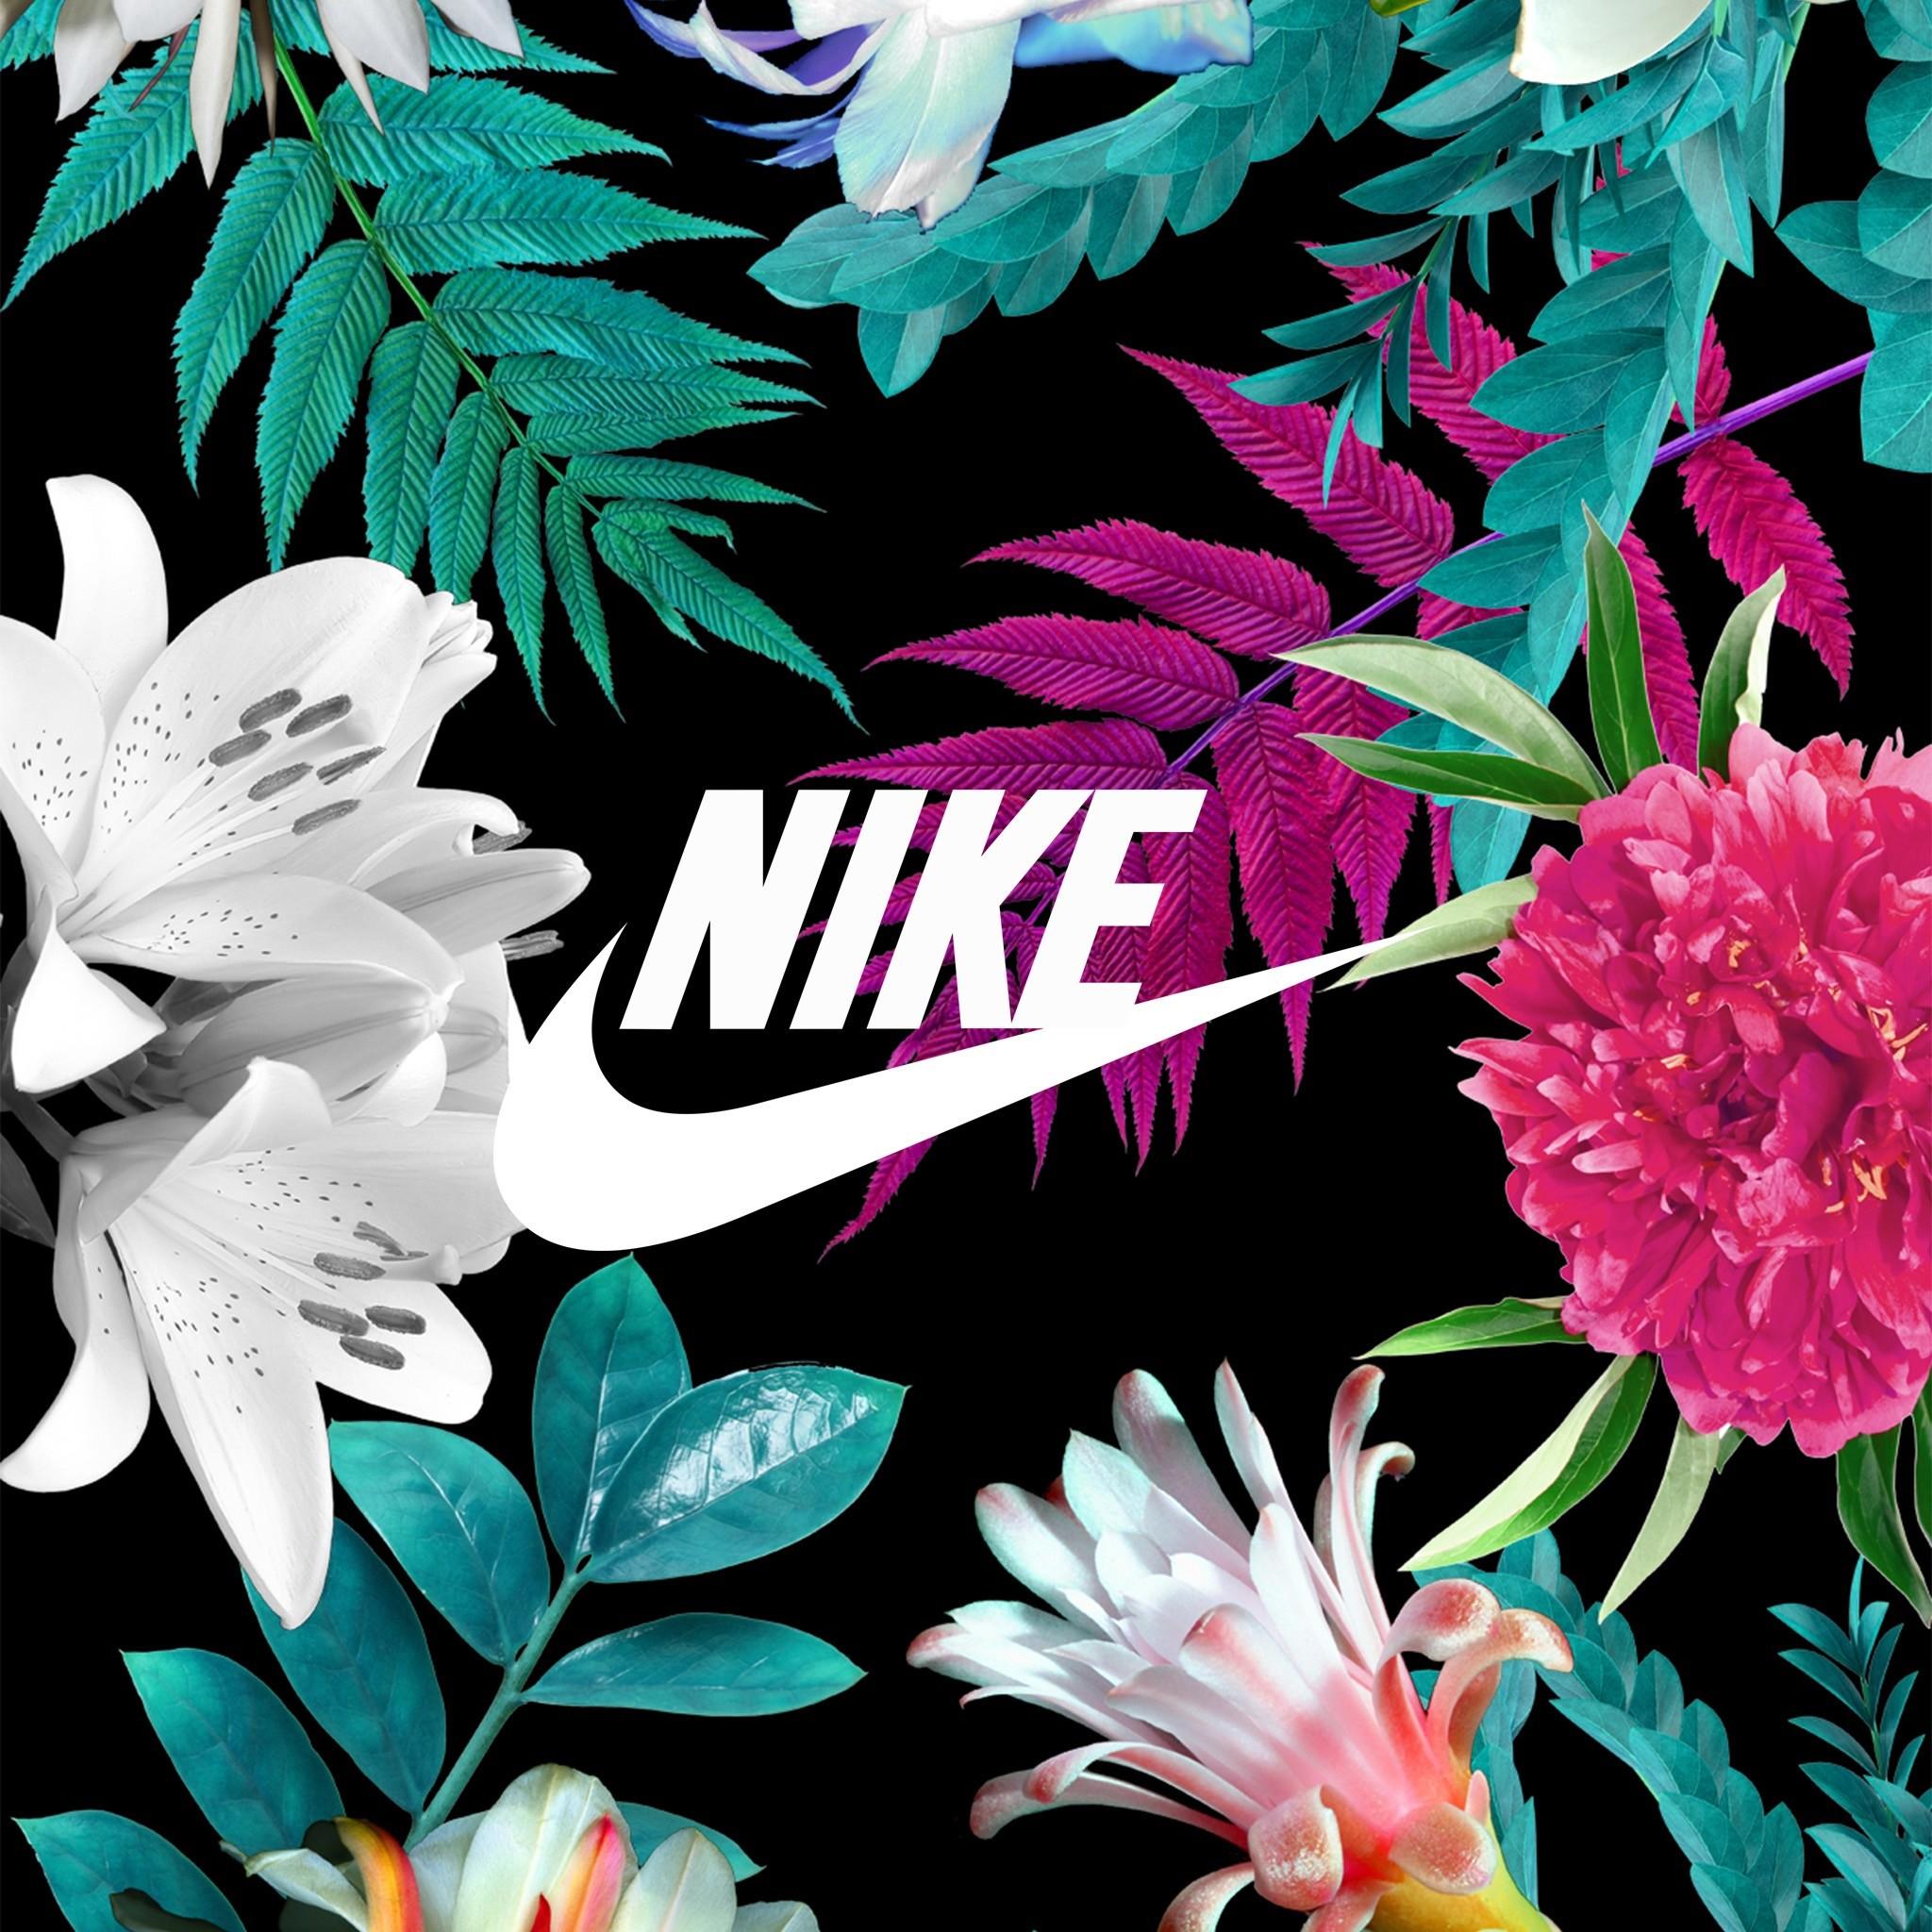 Nike Girl Wallpaper Iphone Dope Nike Wallpaper 79 Images